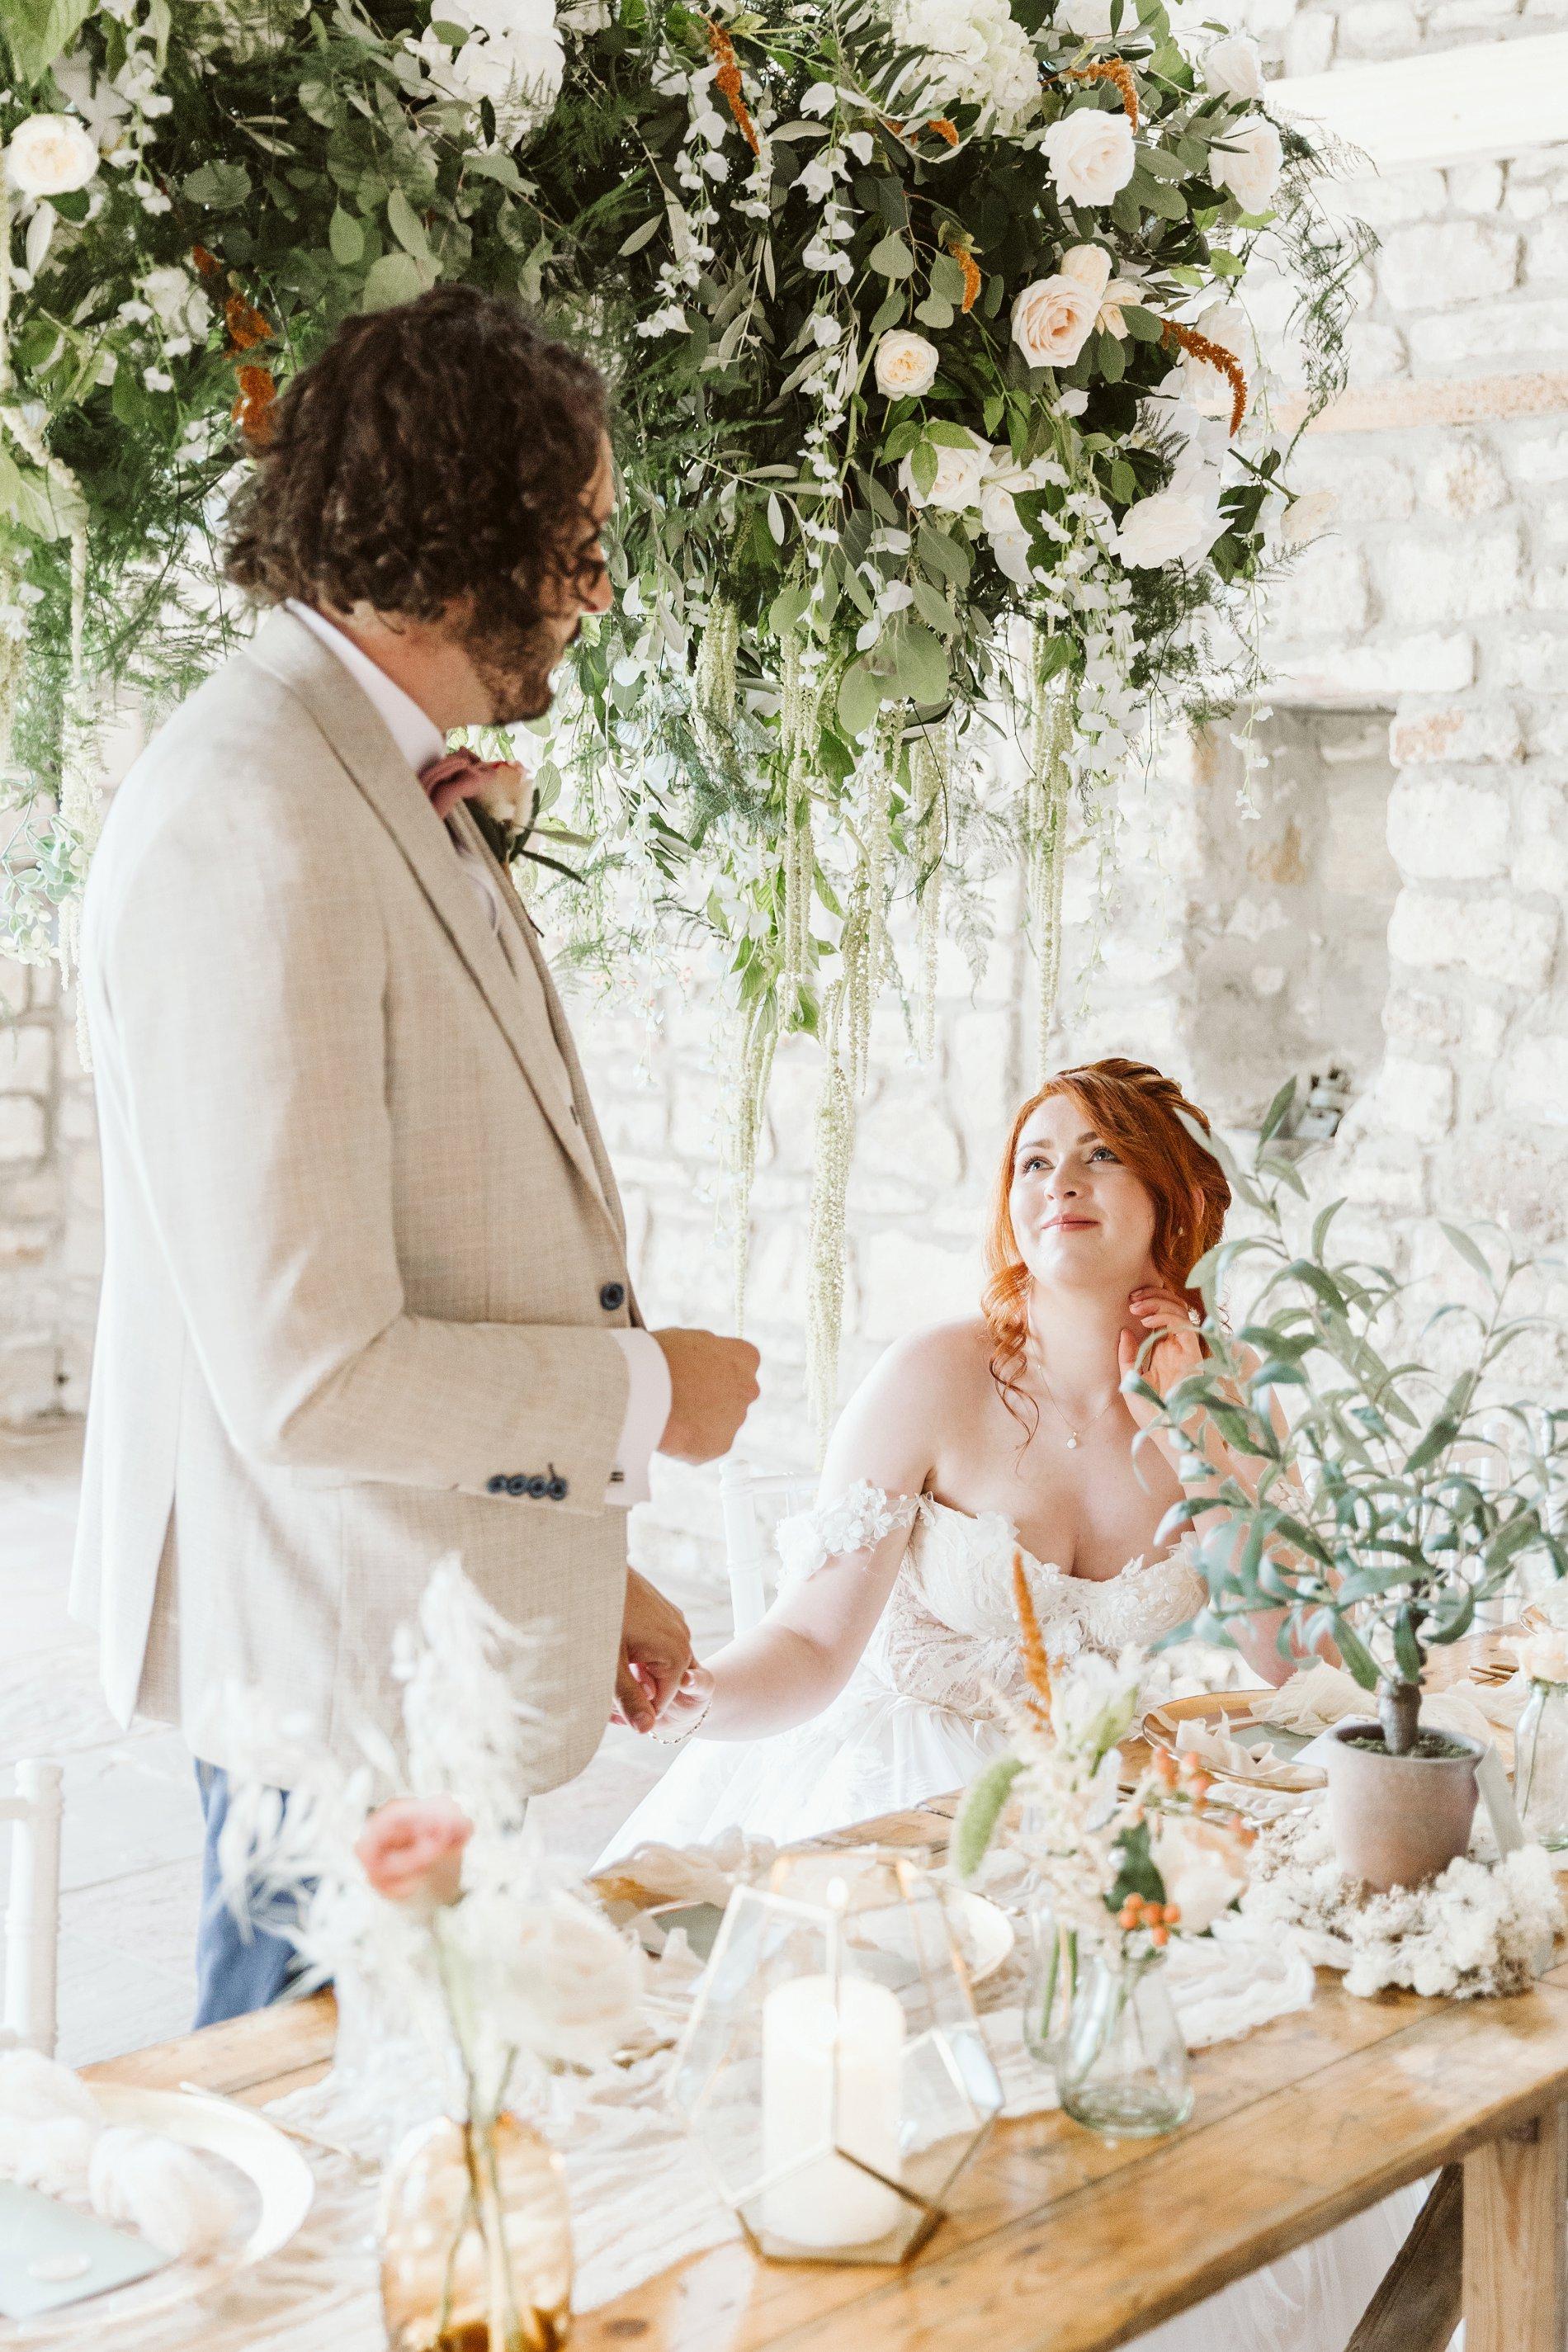 Saying I Do Rustic Wedding Creative Shoot (c) Charlotte Eve Photography (30)